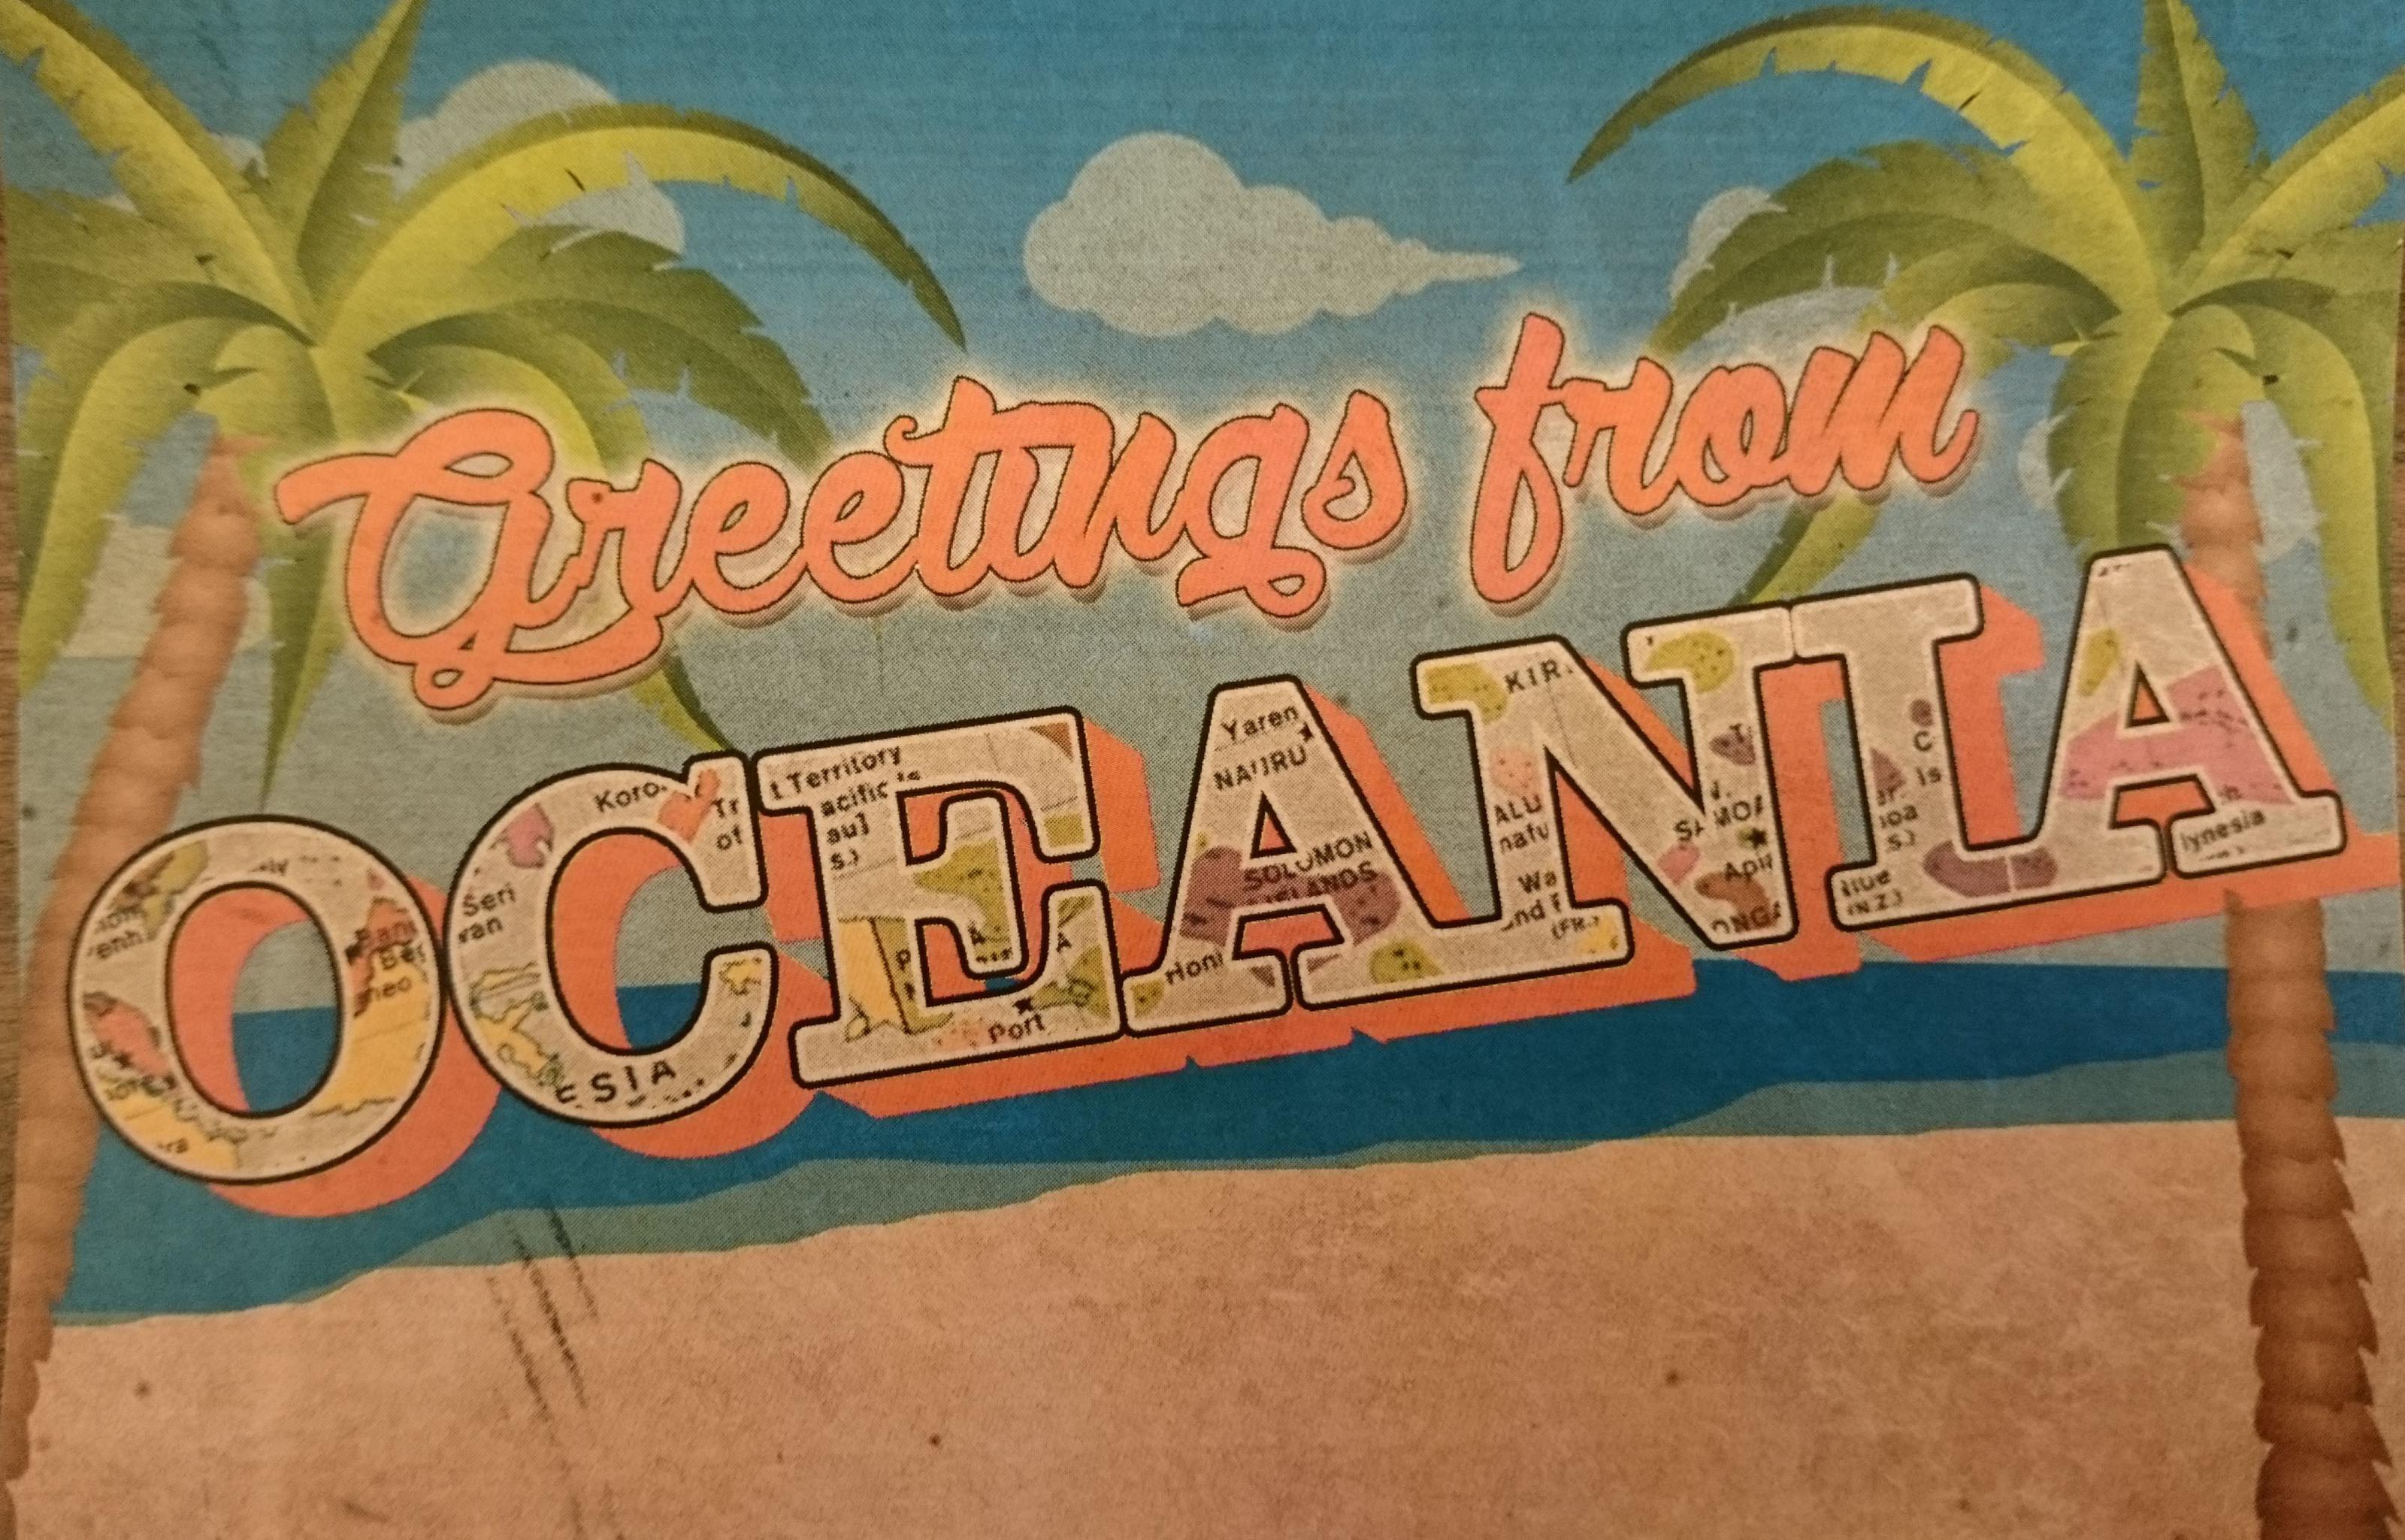 Greetings from Oceana postcard